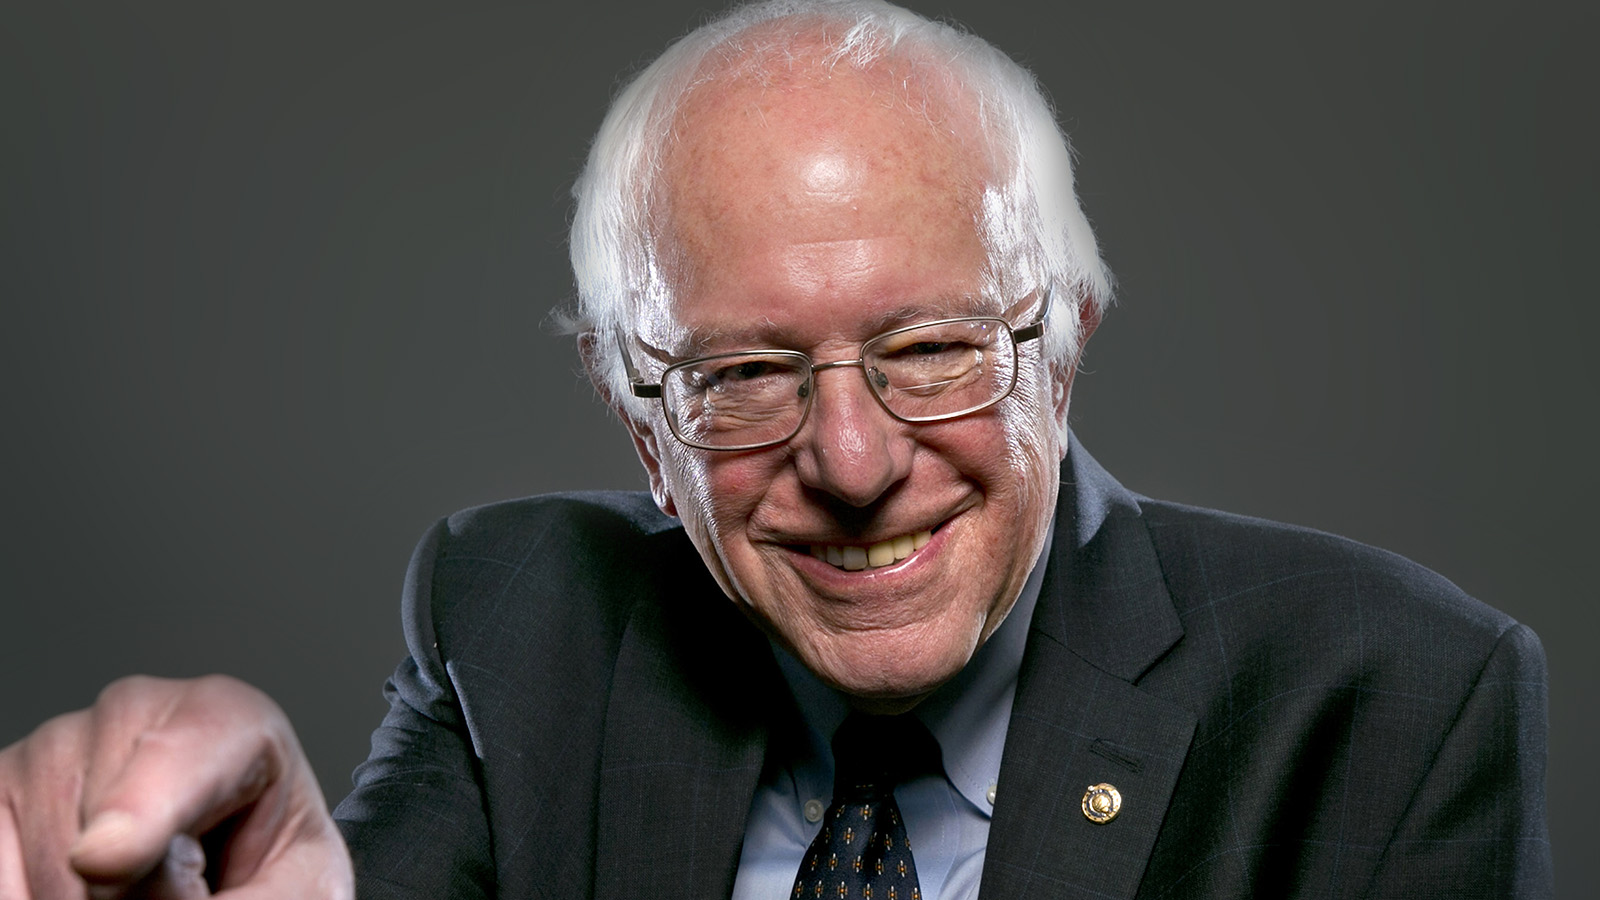 Bernie Sanders Wallpaper Download: 1680 X 1050